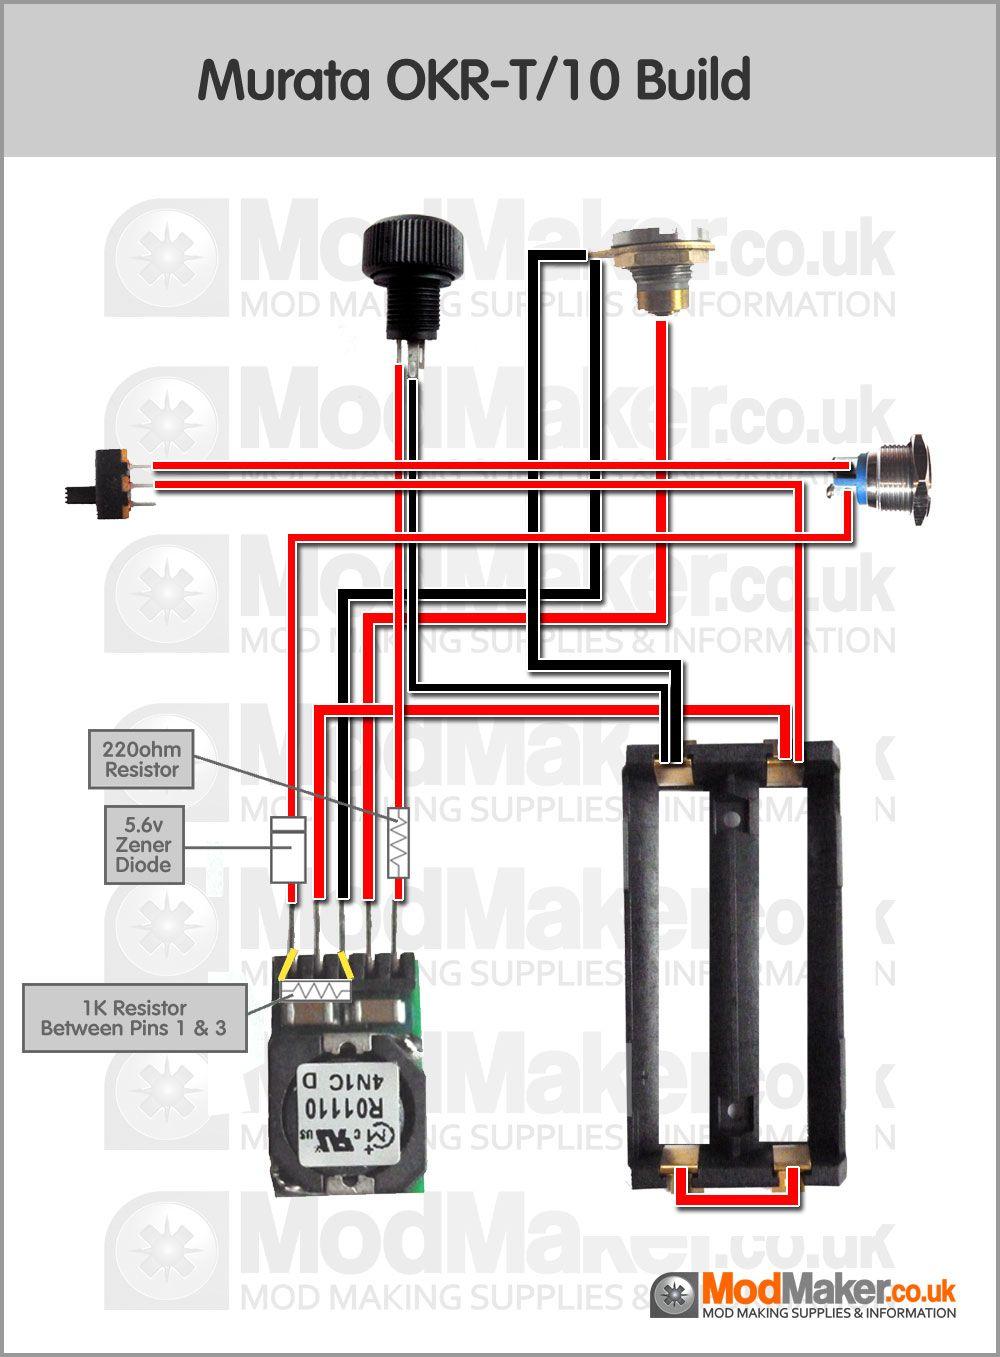 16476cf7b5661fcfadc007f190f7265c pwm wiring diagram motley mods wiring diagram at edmiracle.co